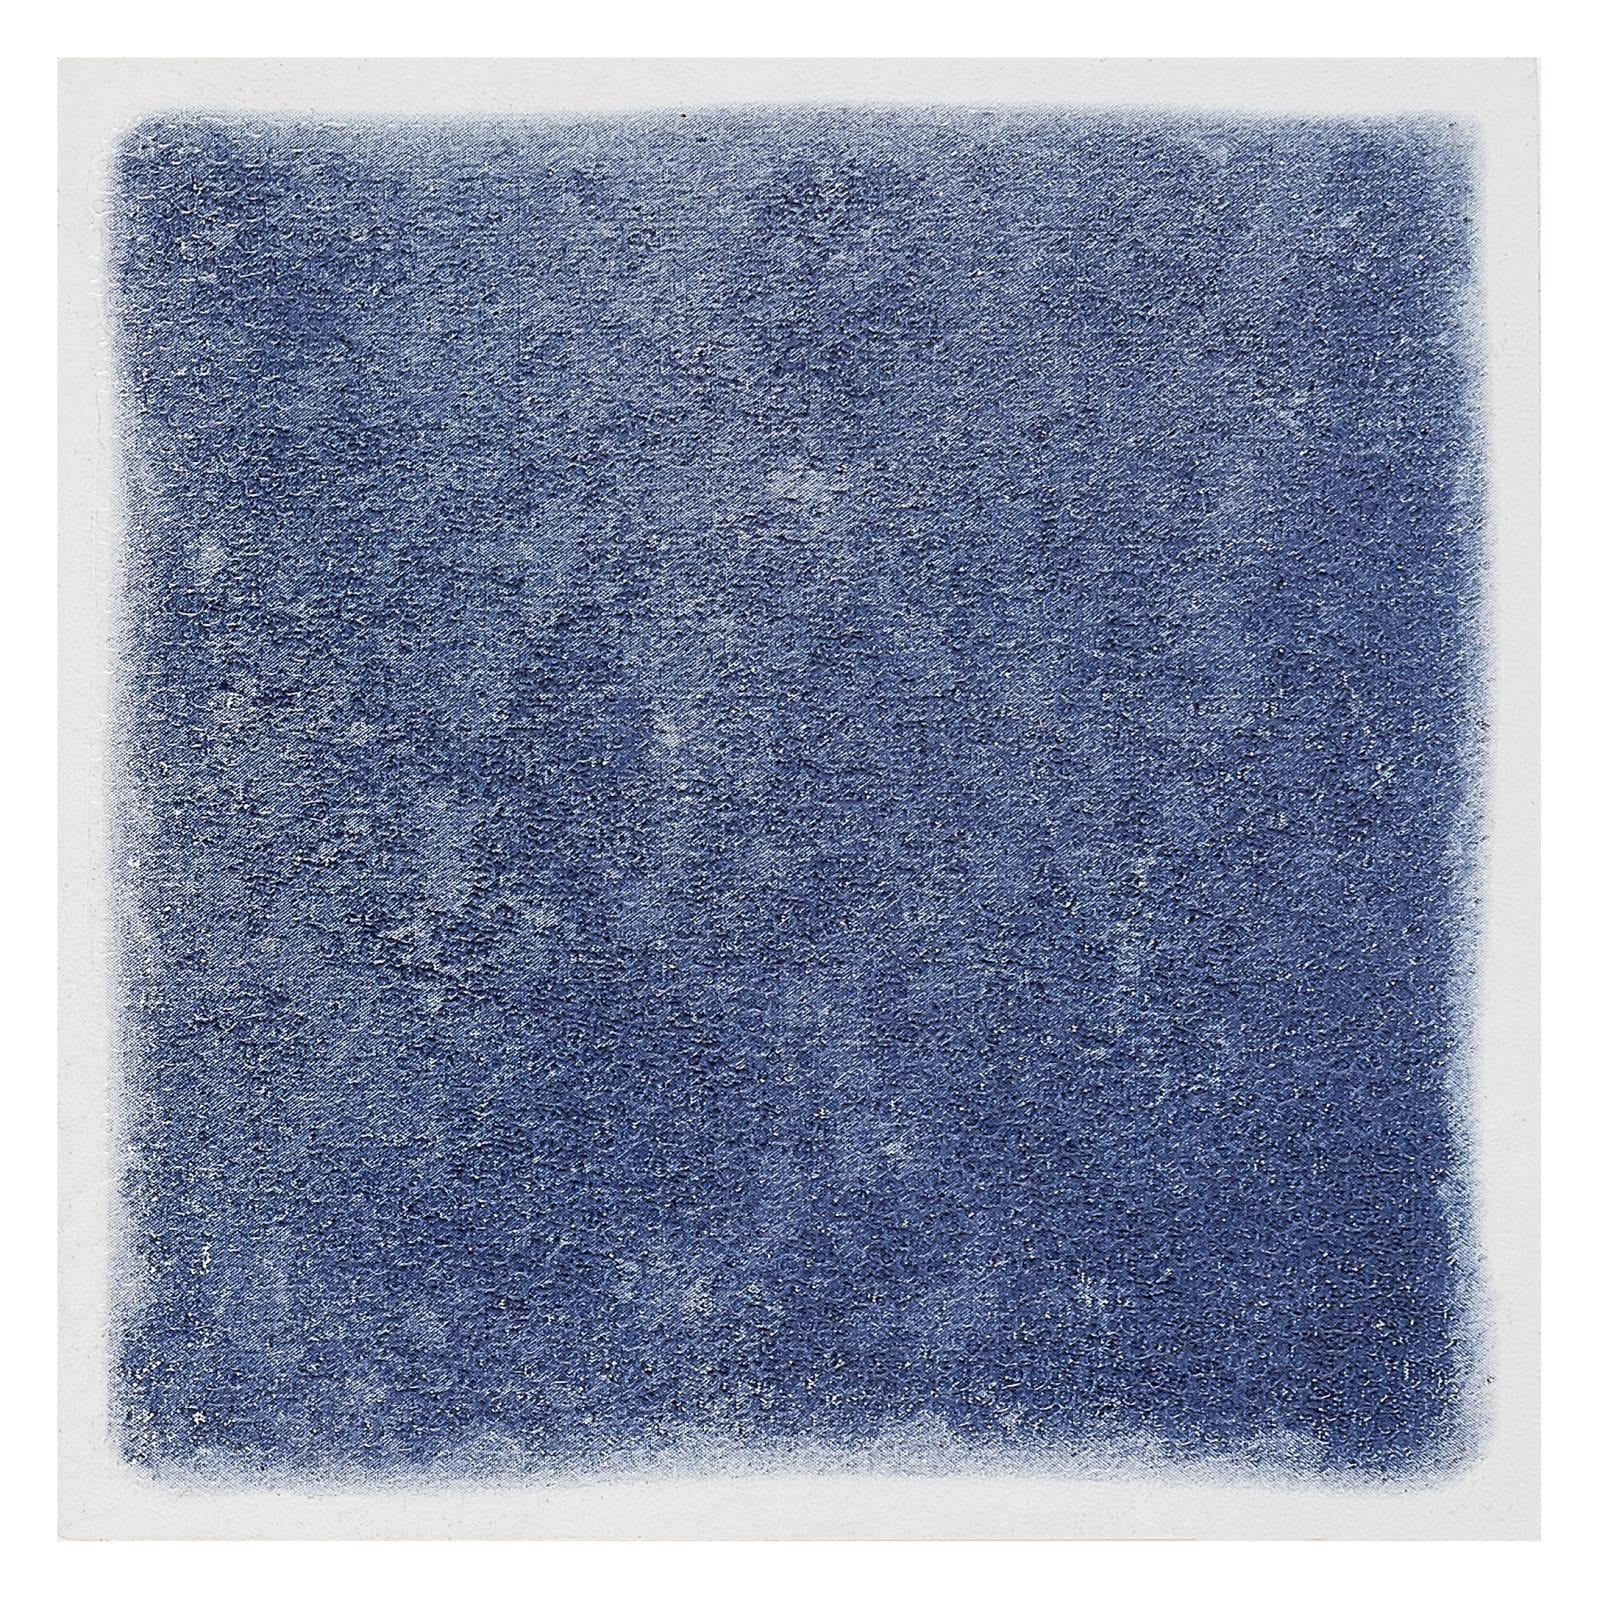 Shop Nexus Blue 4x4 Self Adhesive Vinyl Wall Tile - 27 Tiles/3 sq ...